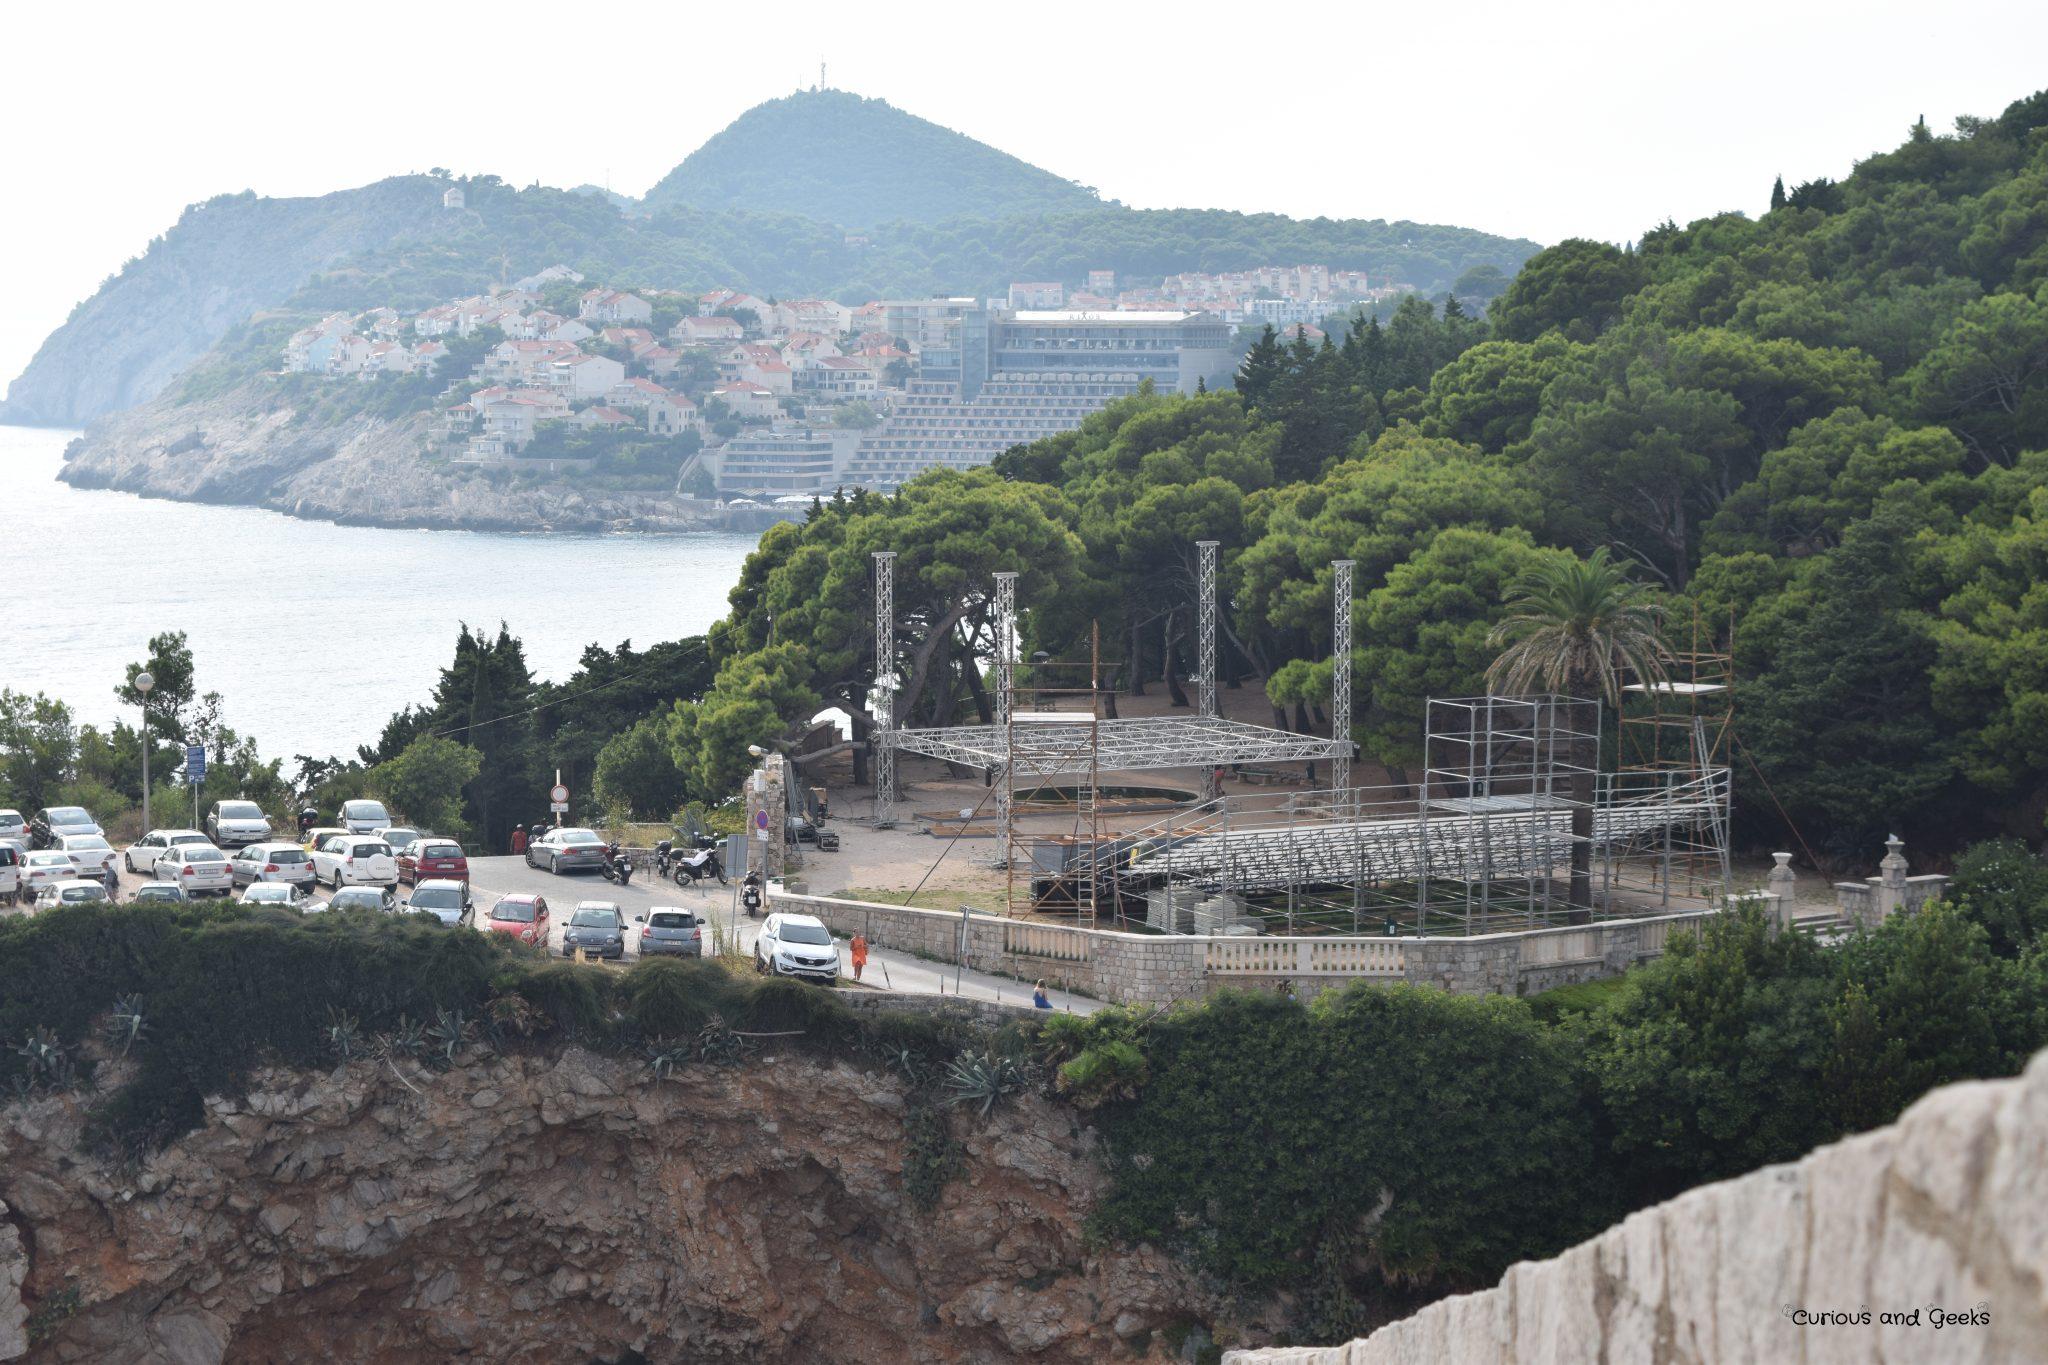 17. Gradac Park - Game of Thrones filming locations in Dubrovnik